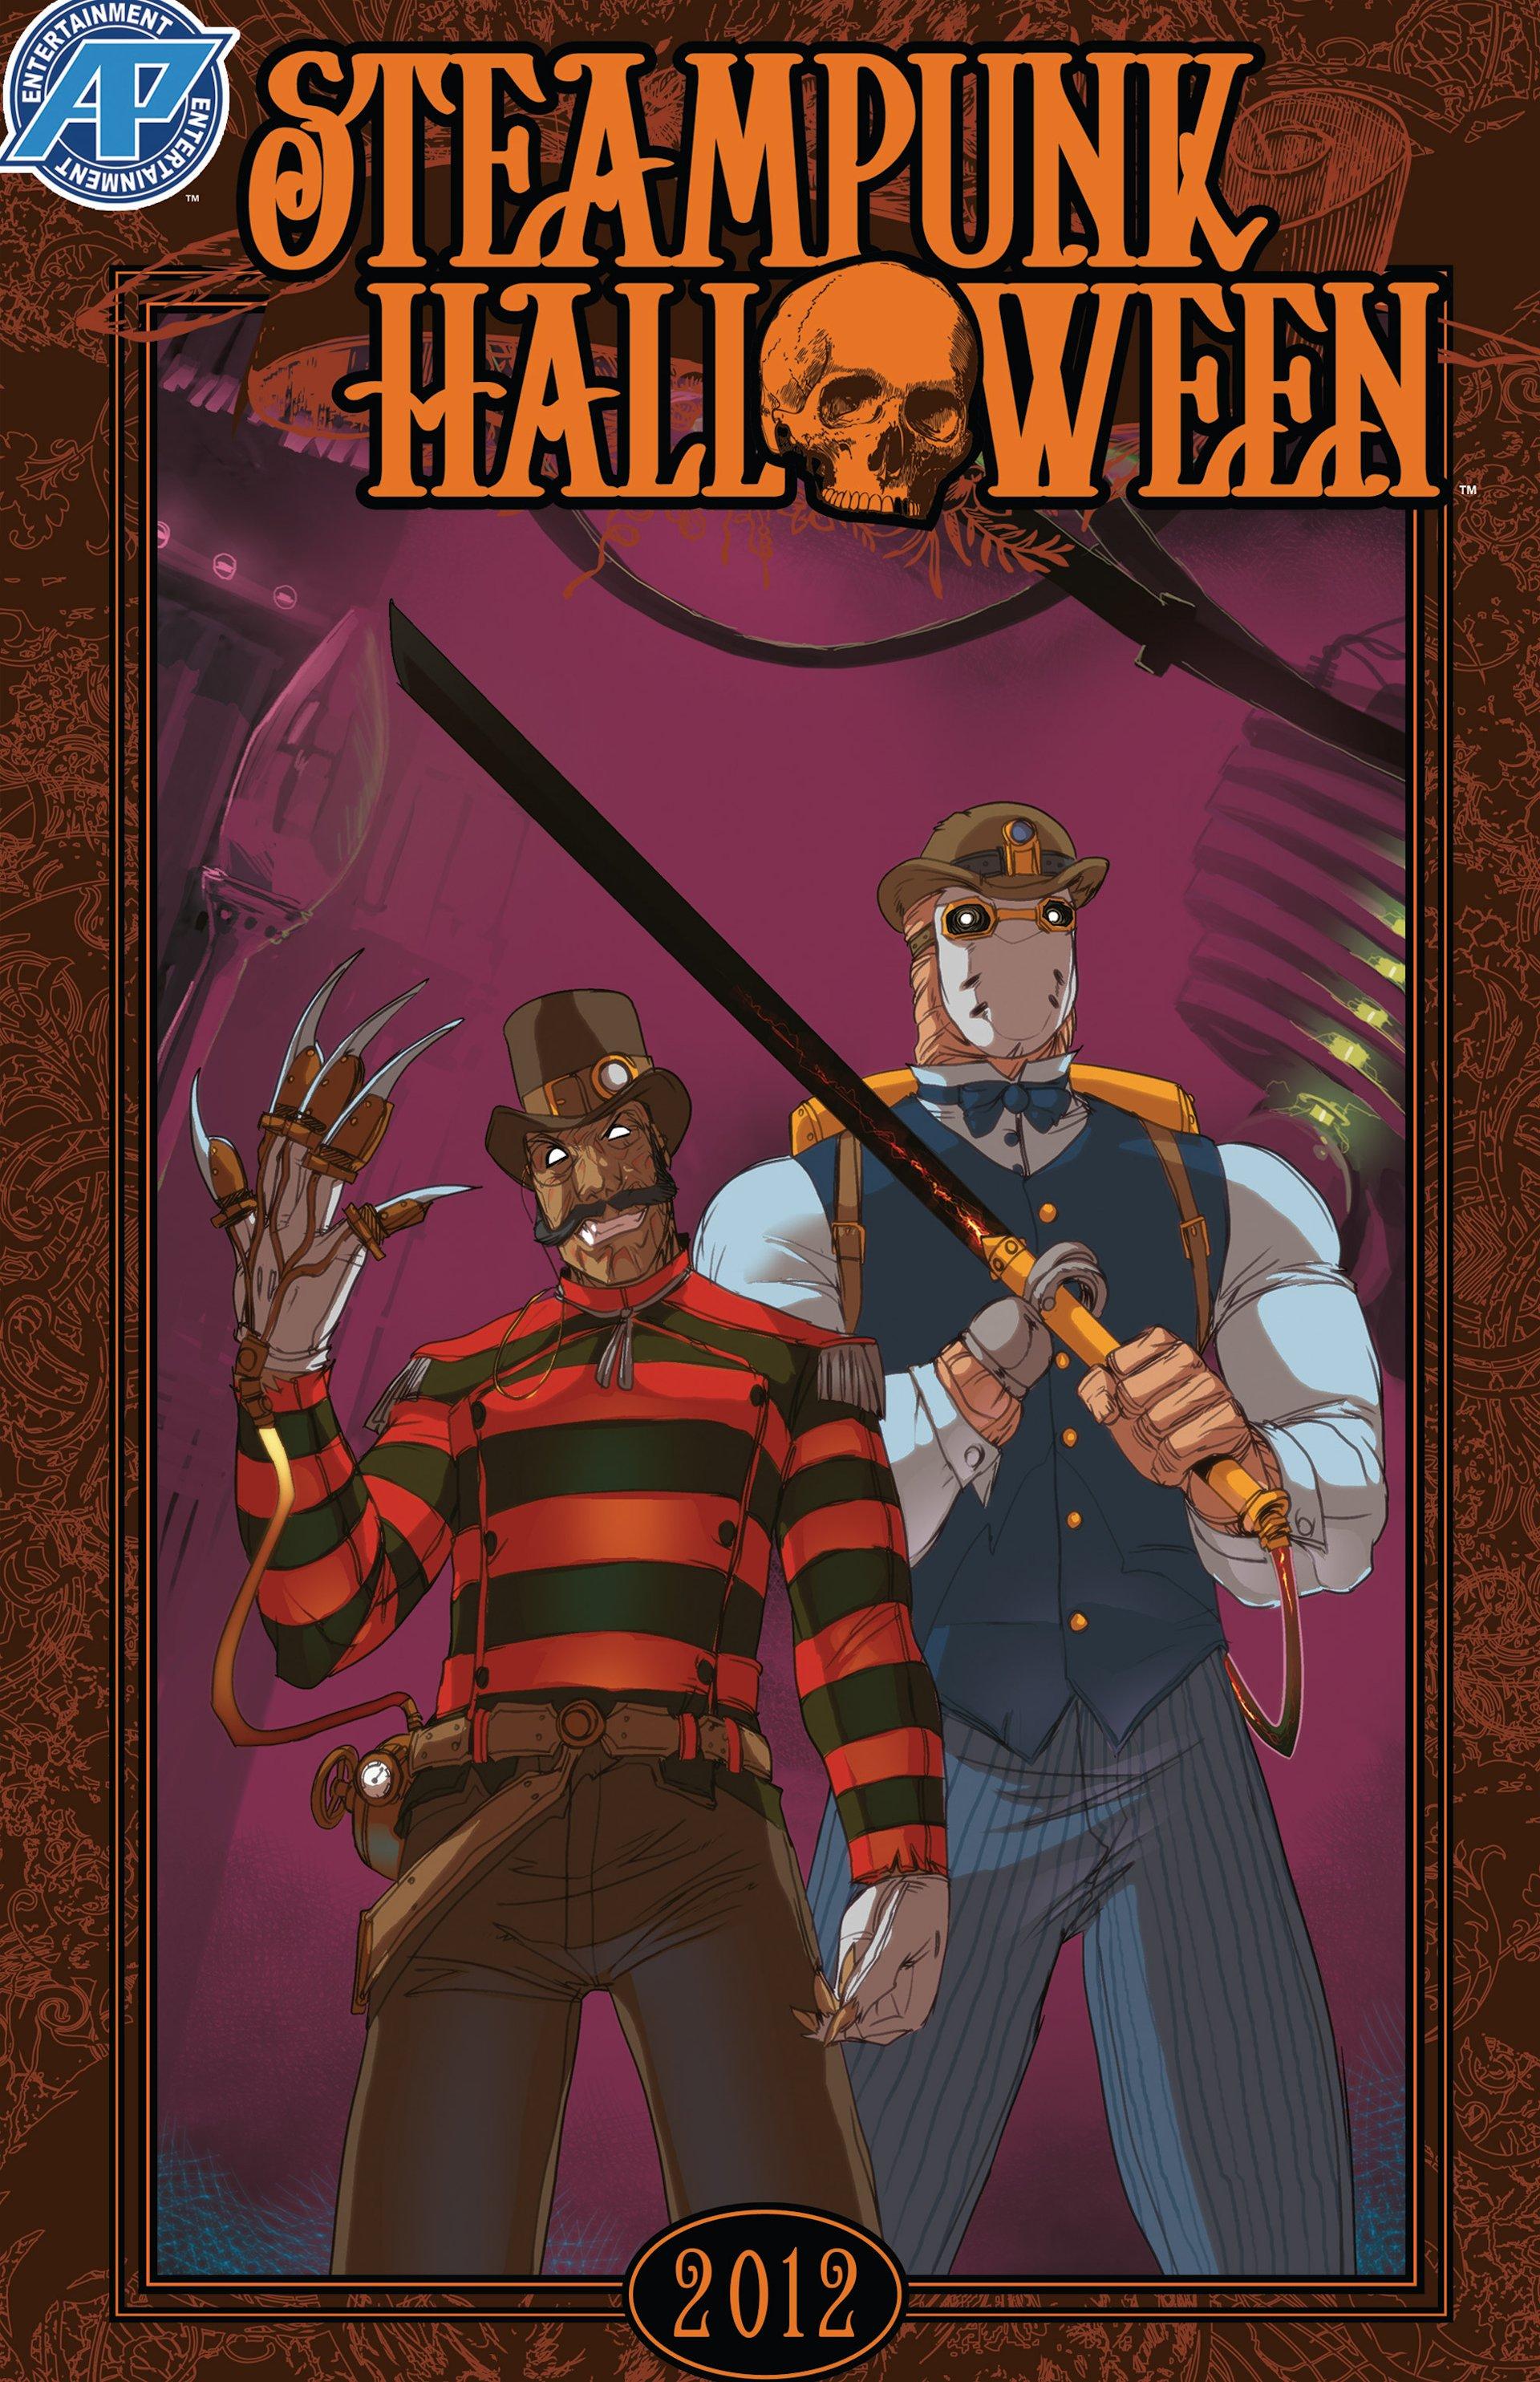 Read online Steampunk Halloween 2012 comic -  Issue # Full - 1